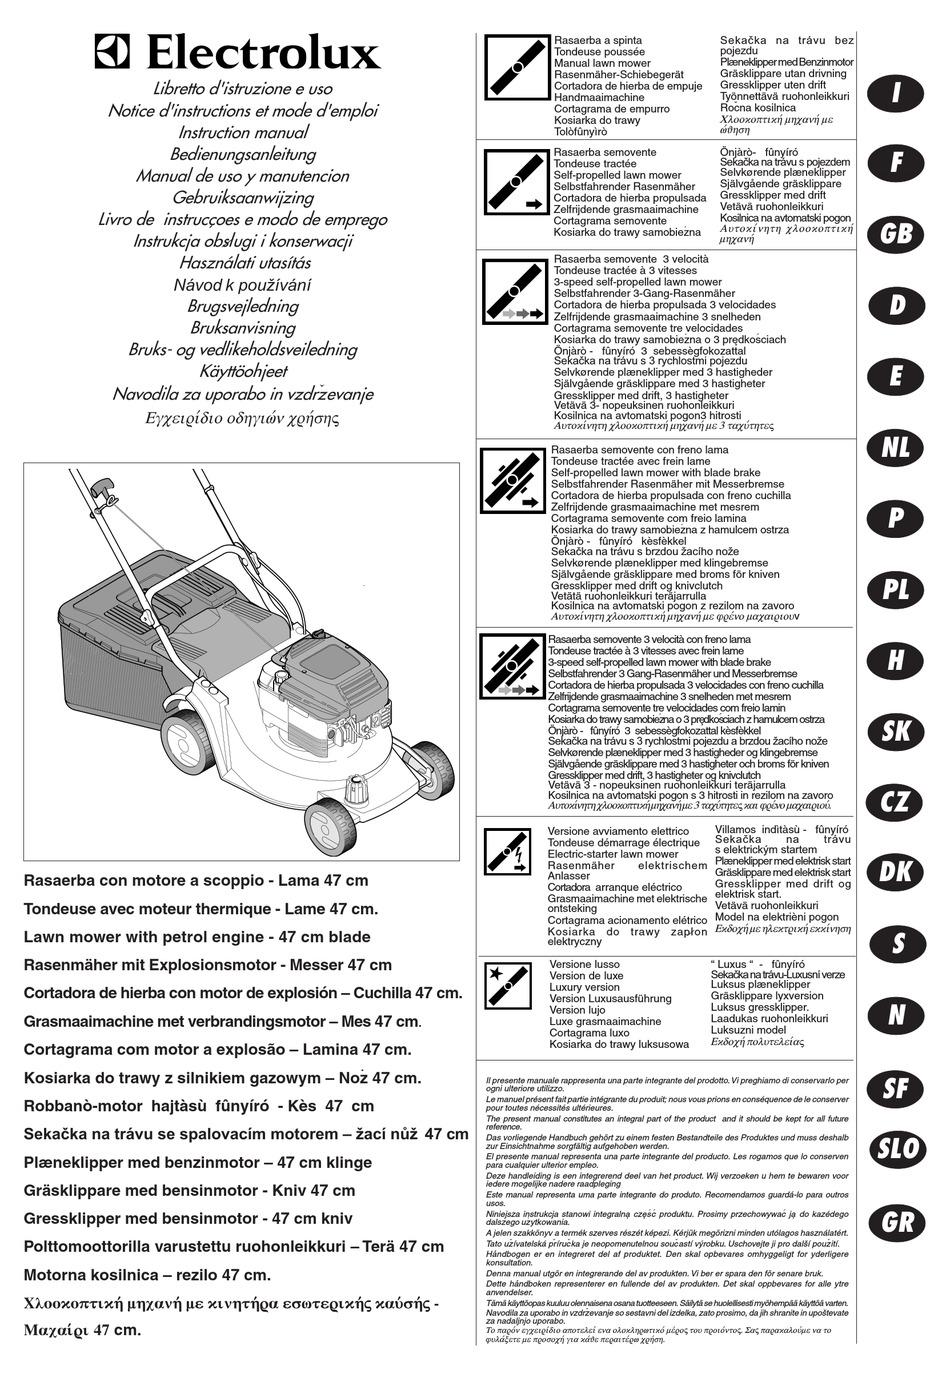 ELECTROLUX LAWN MOWER INSTRUCTION MANUAL Pdf Download